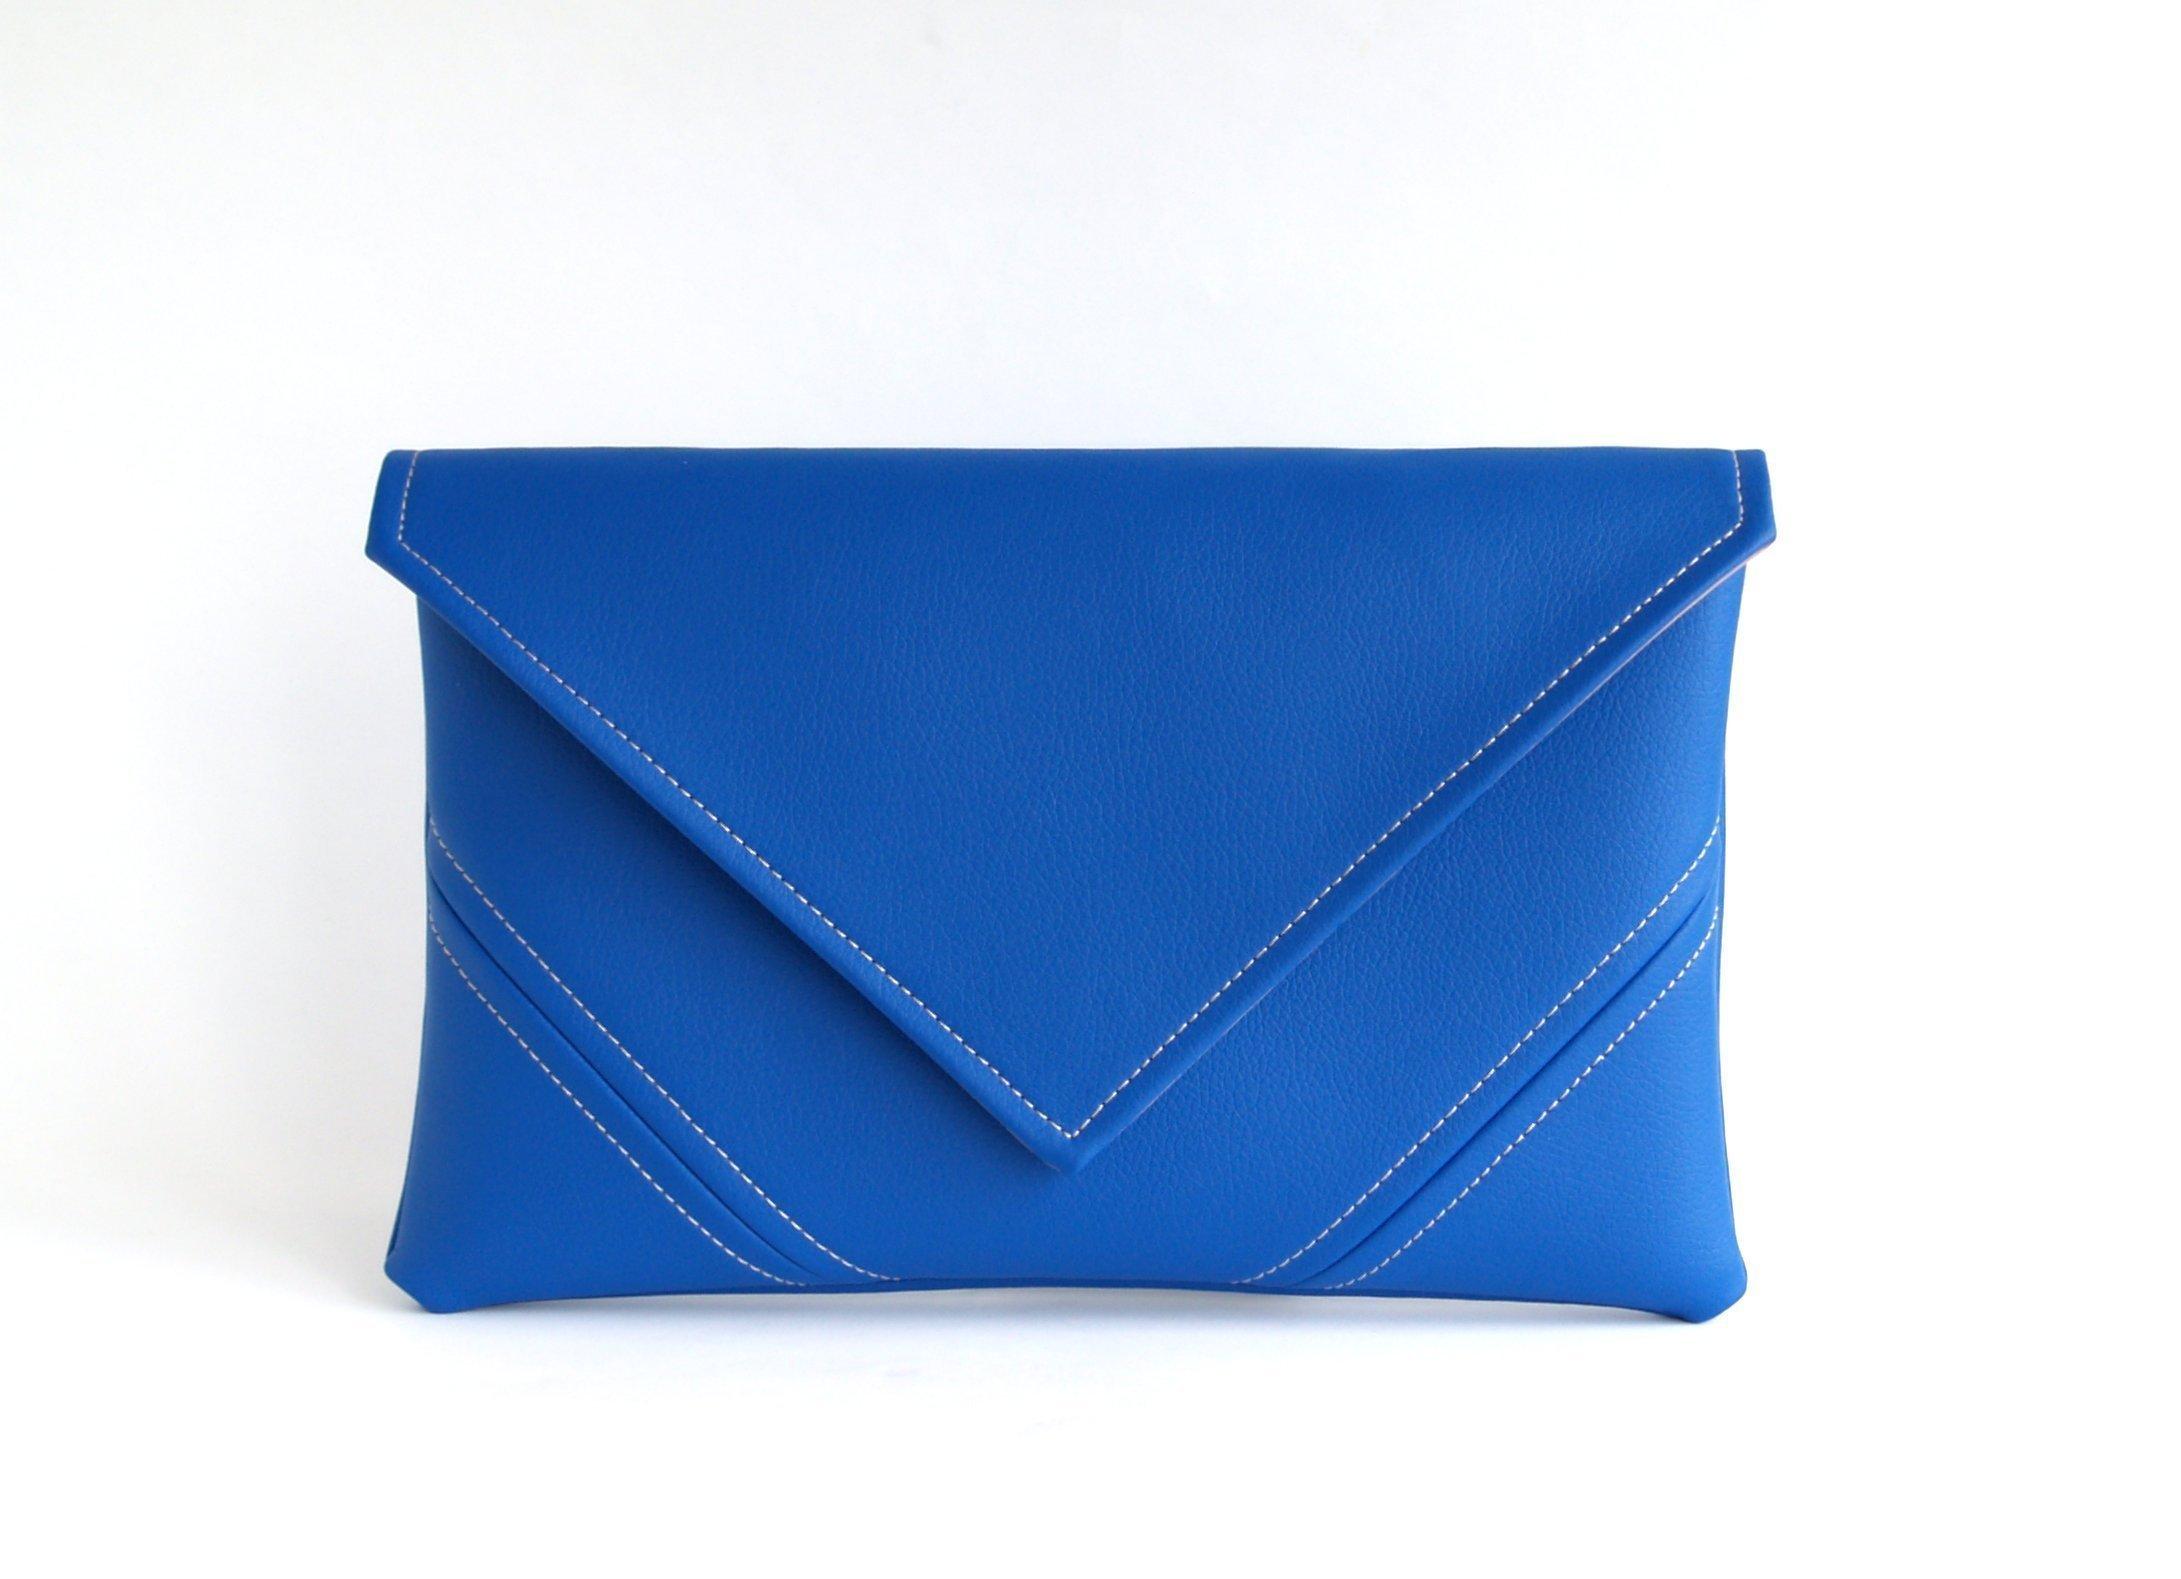 Royal Blue Clutch Bag Handmade Cobalt Vegan Bag Vegan Leather Clutch Purse Bridesmaid Clutch Vegan Purse Gift For Her Evening Bag Leather Purse